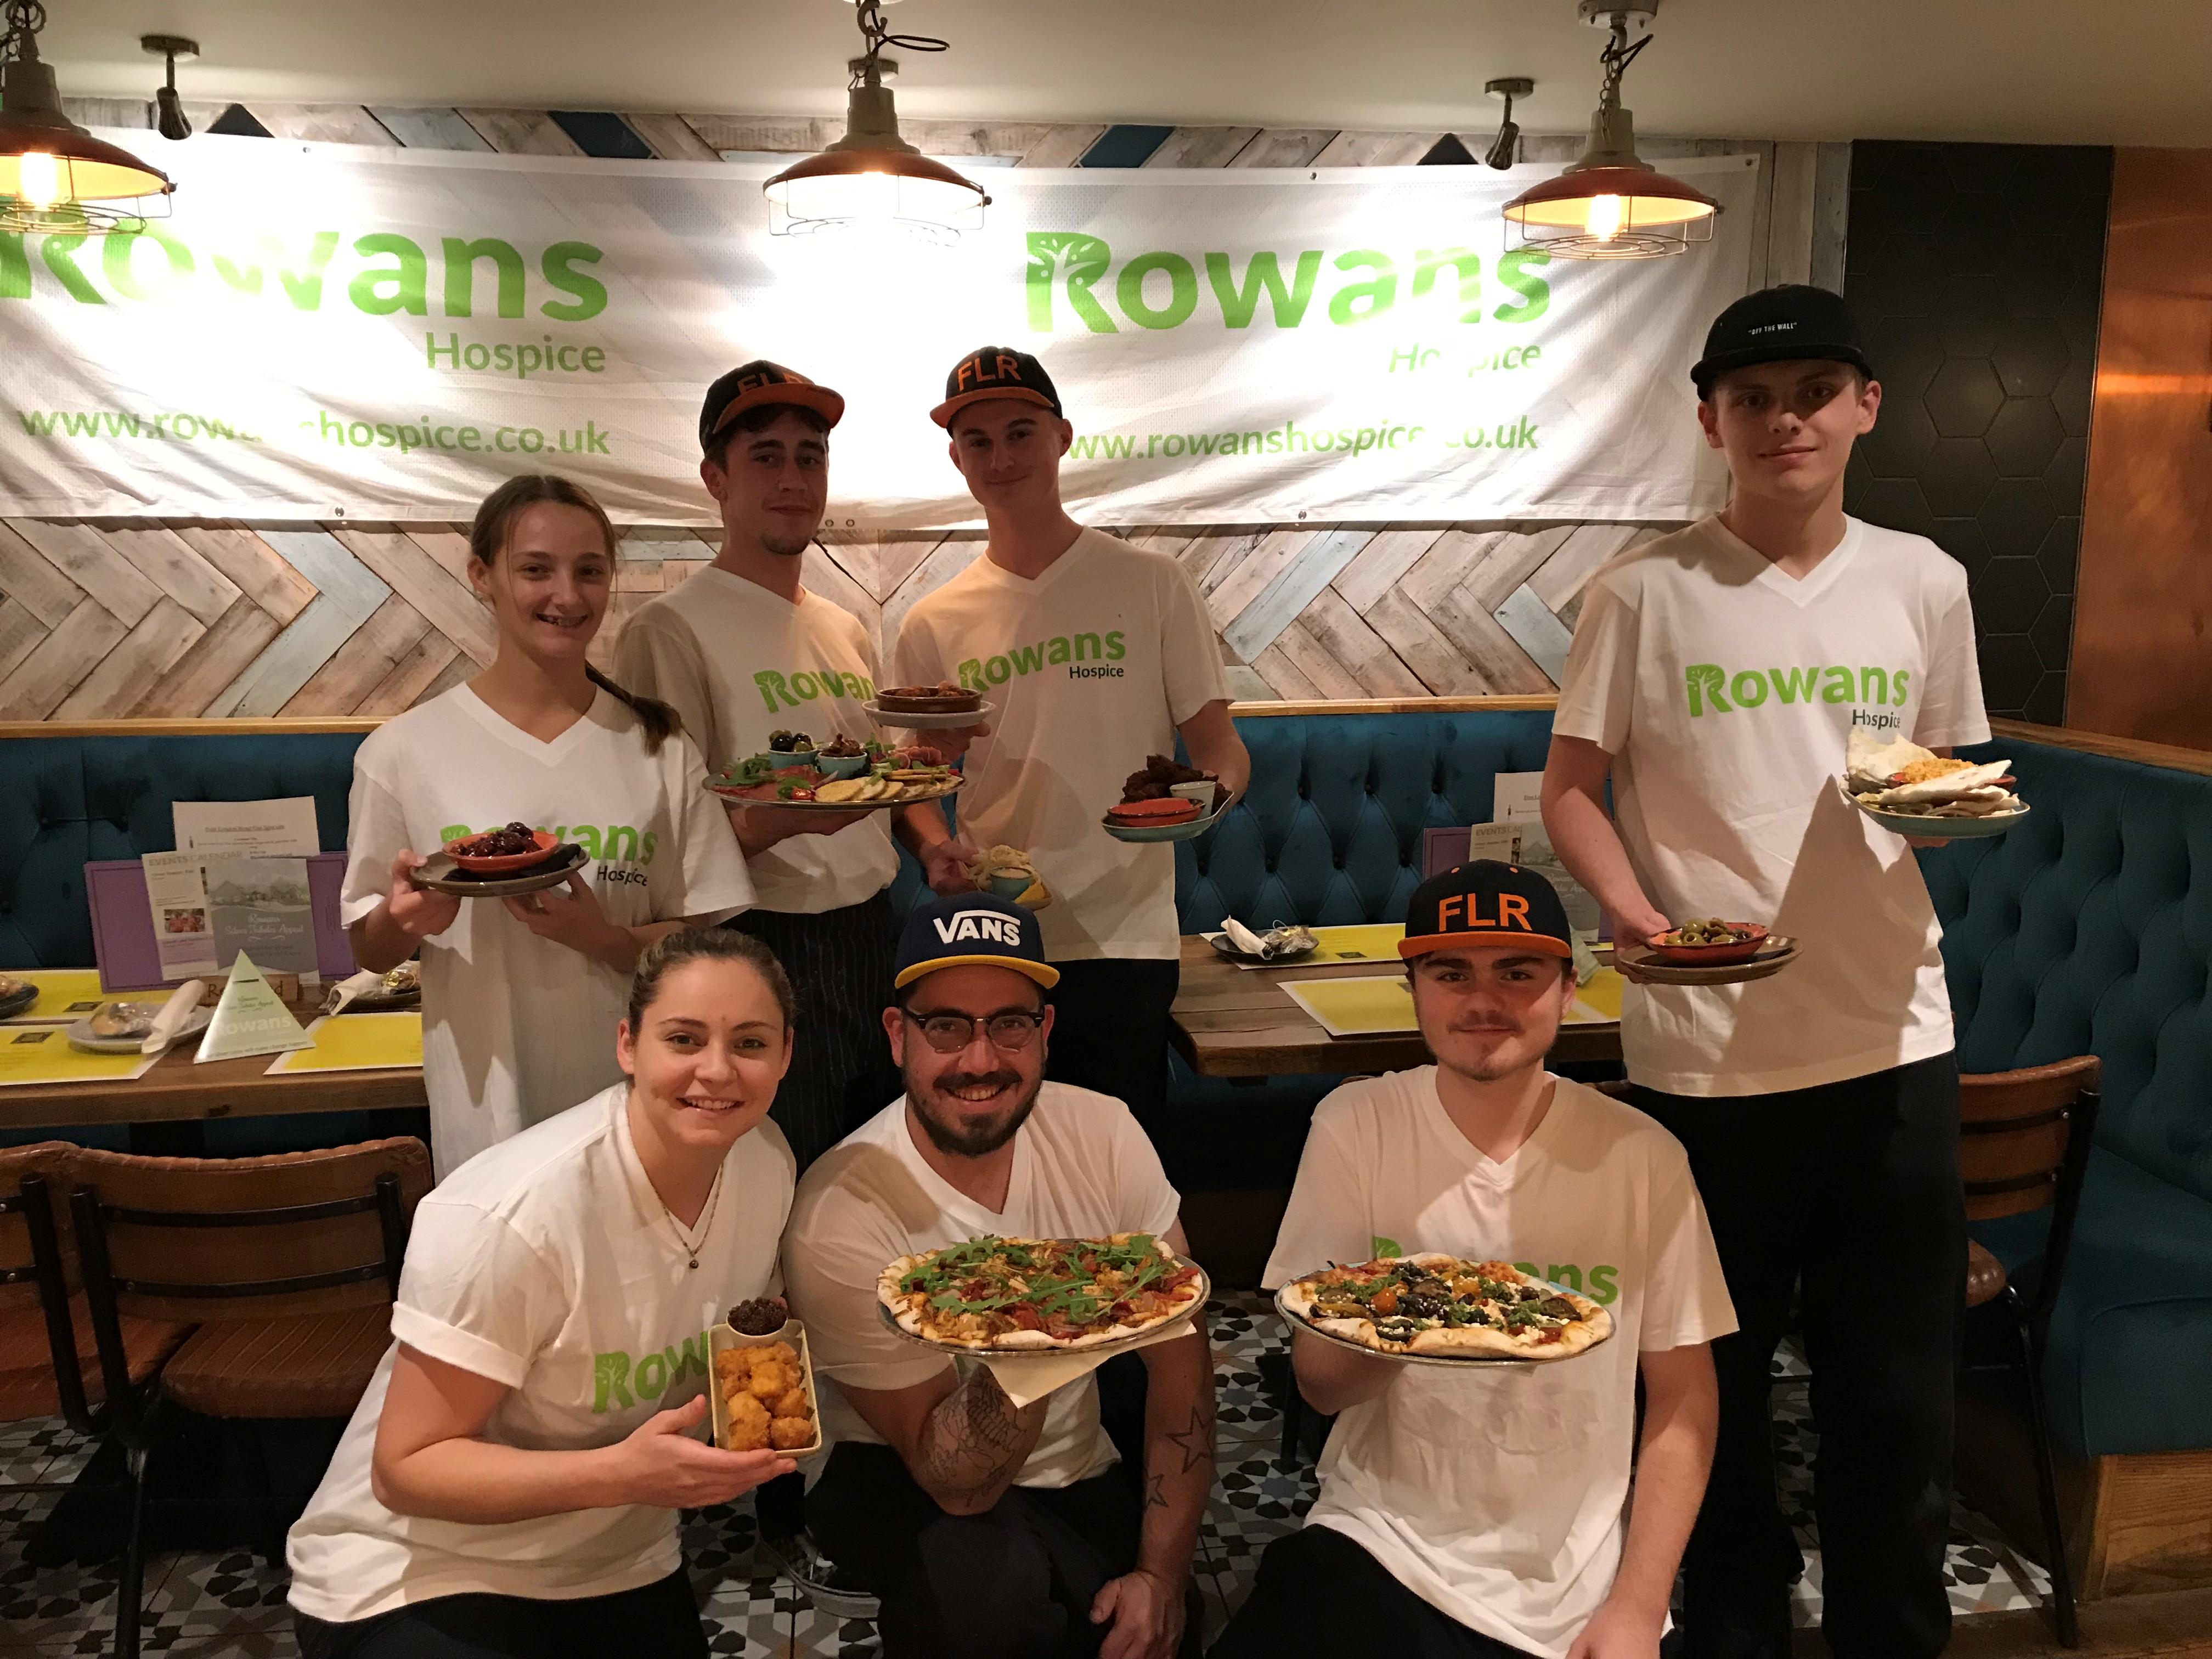 4LR Rowans Staff